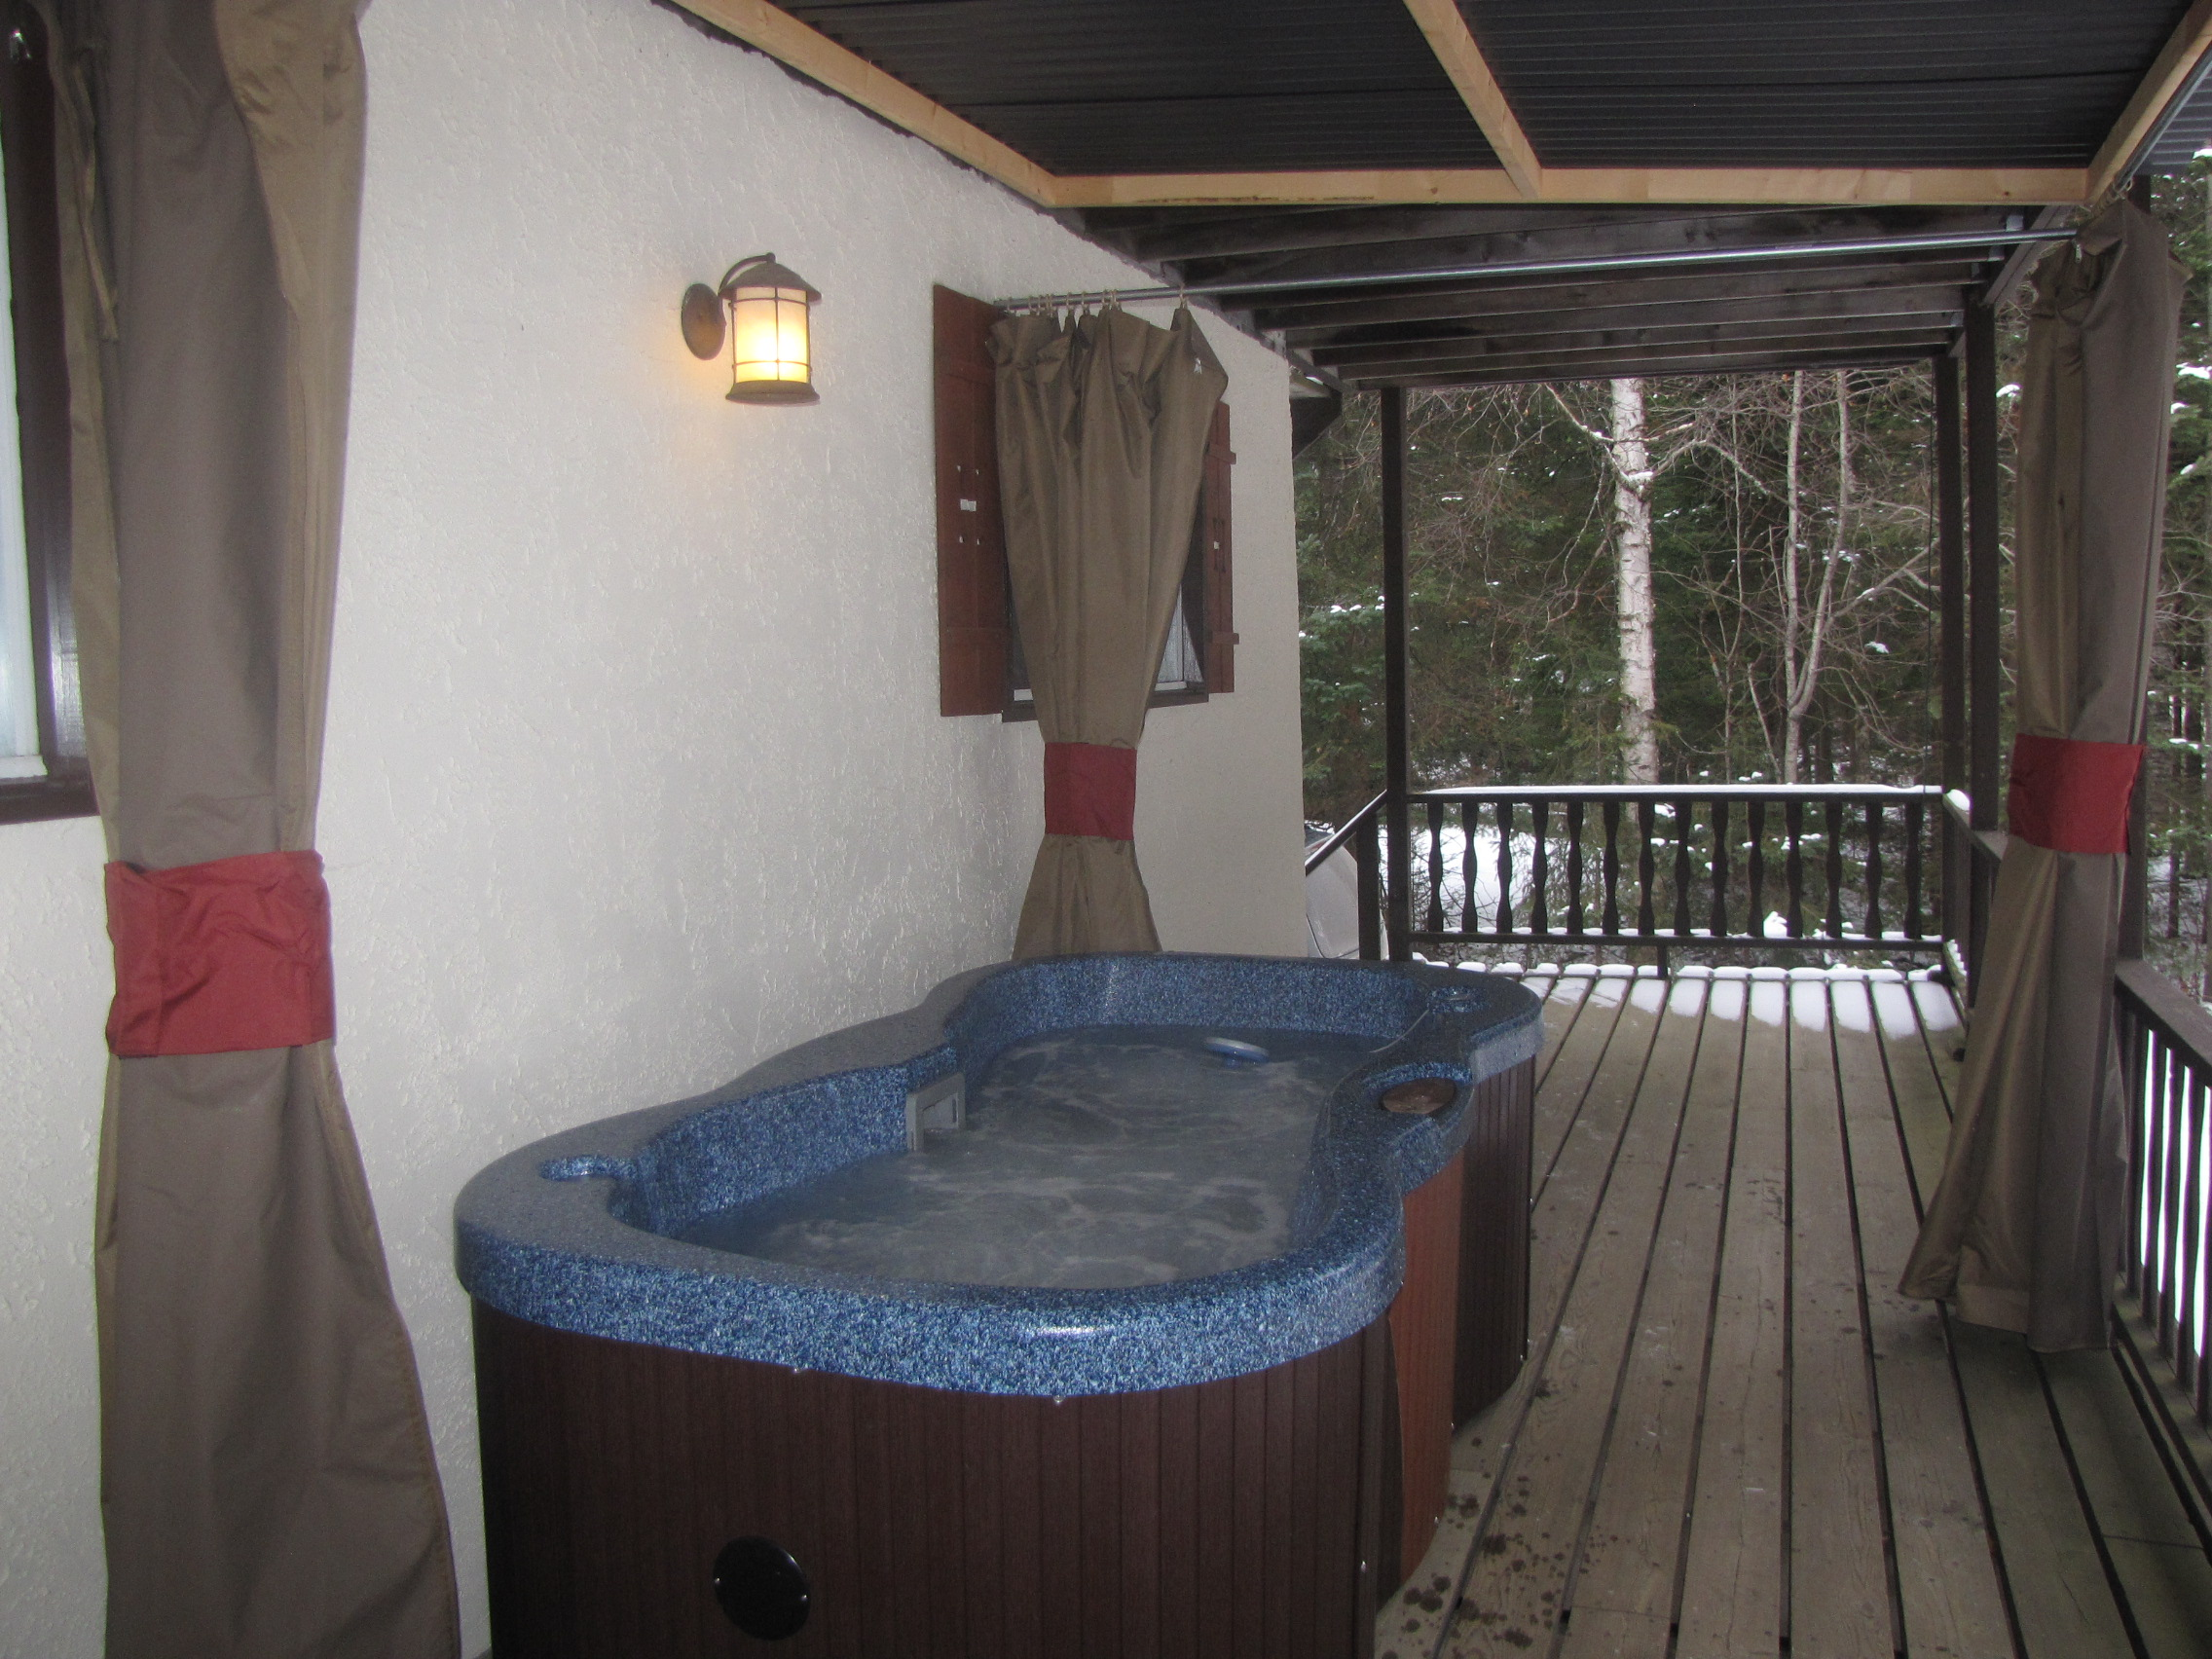 Private Hot Tub Optional